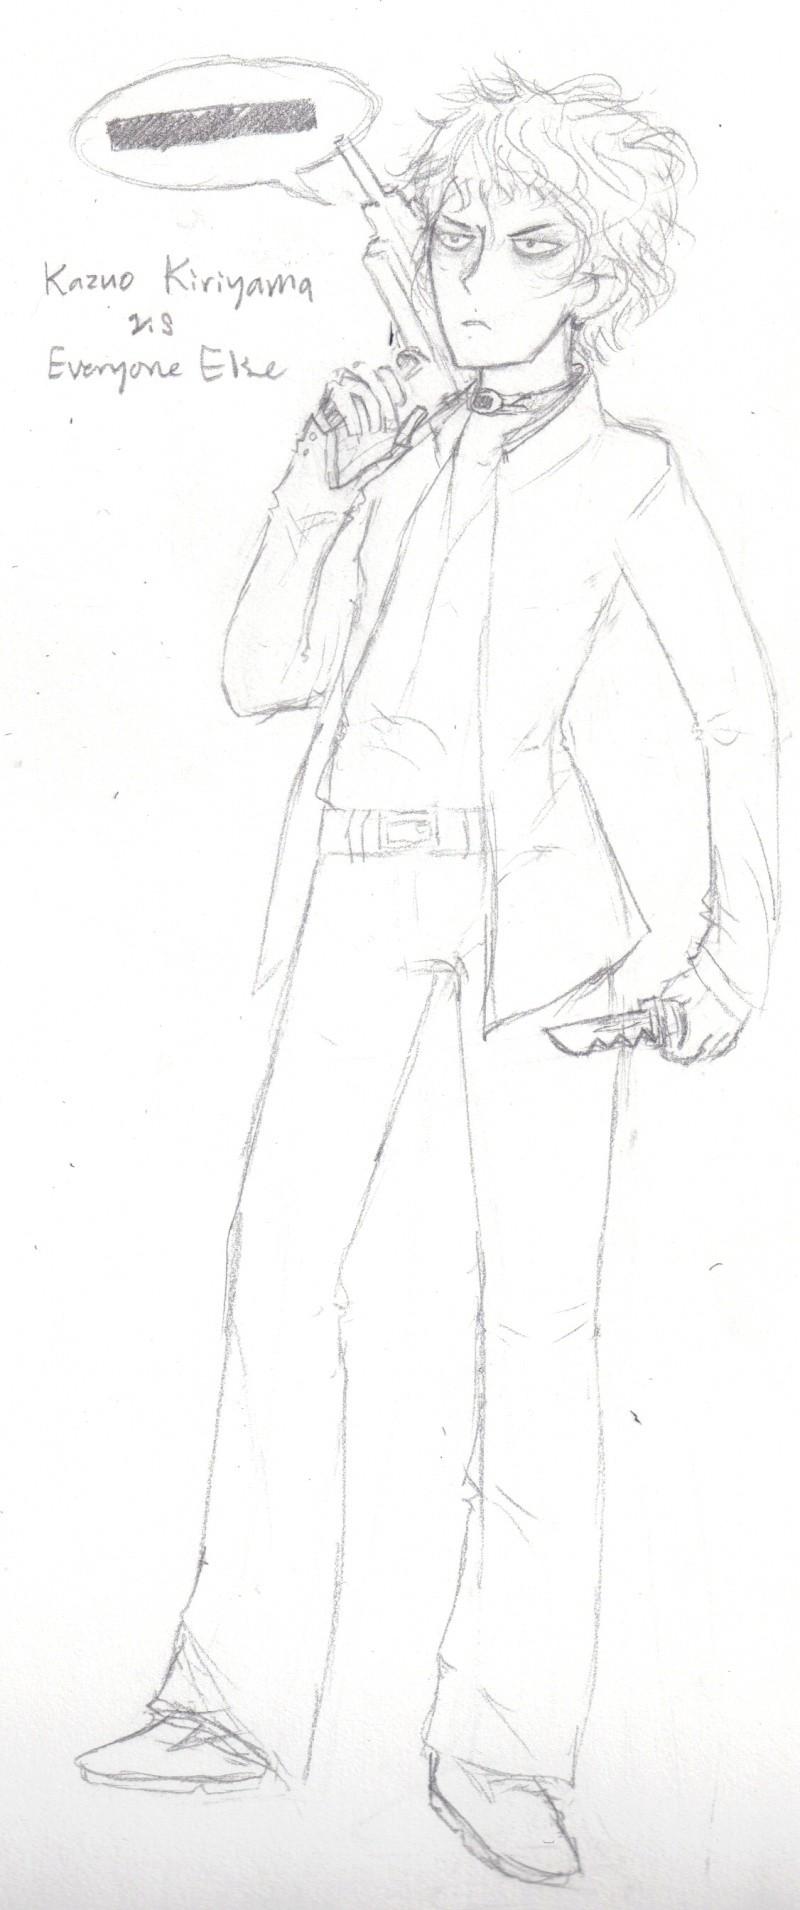 SetsukoNarita's Art Kazuok10